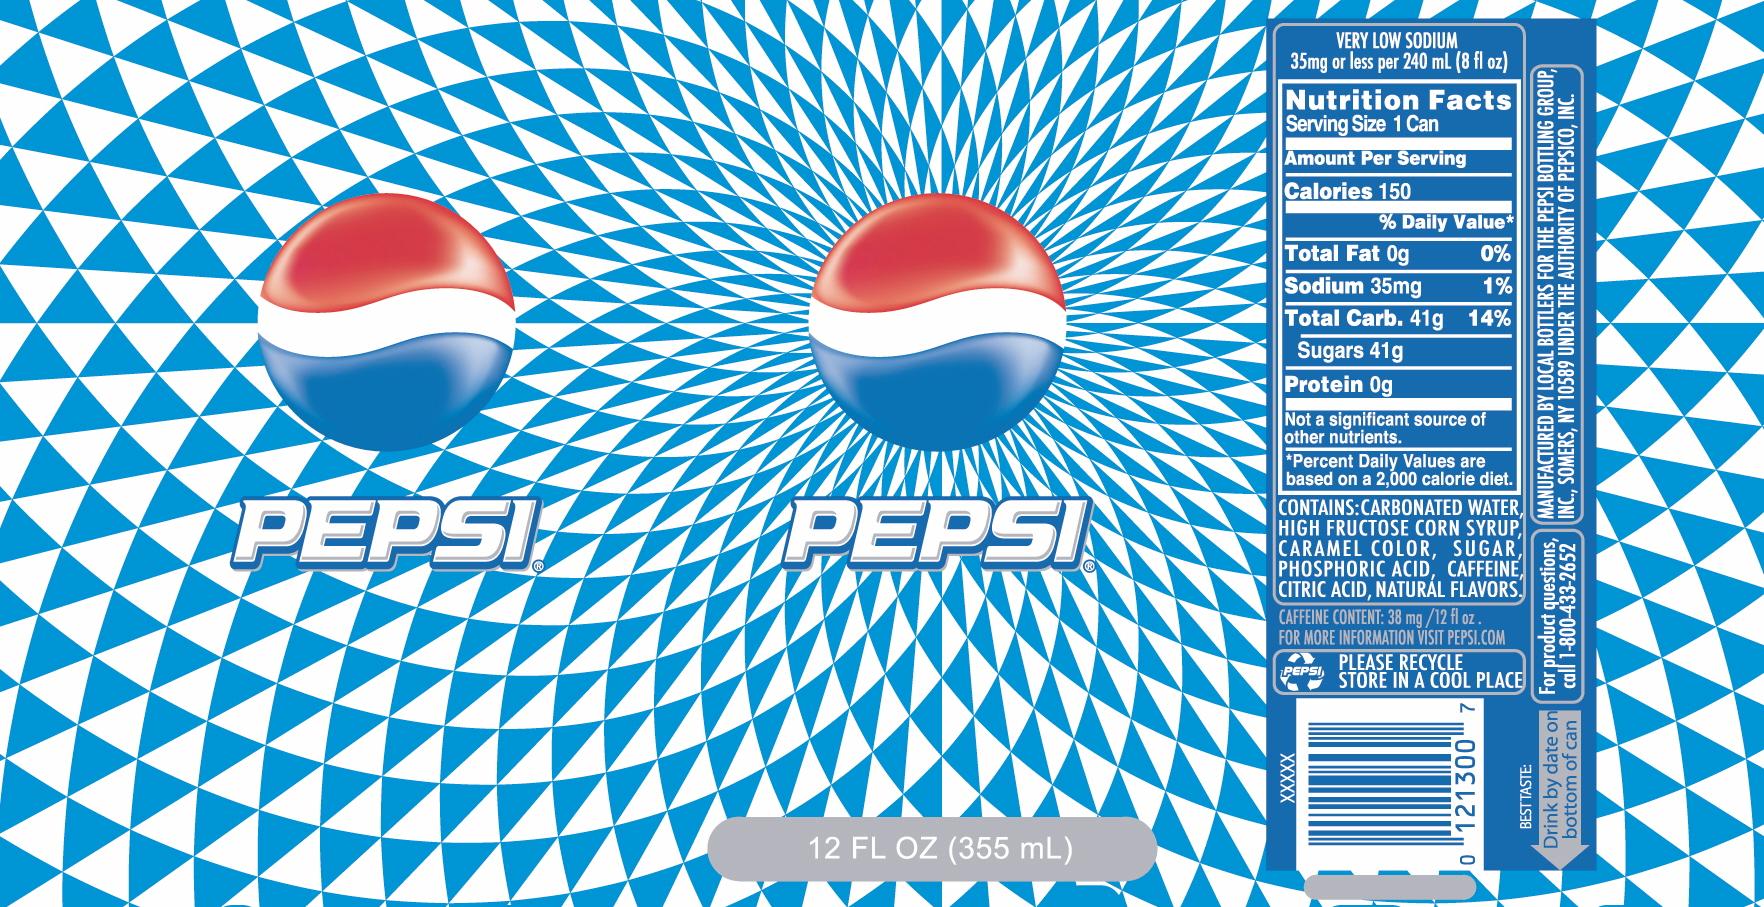 Pepsi Designs by Derek Wells at Coroflot.com